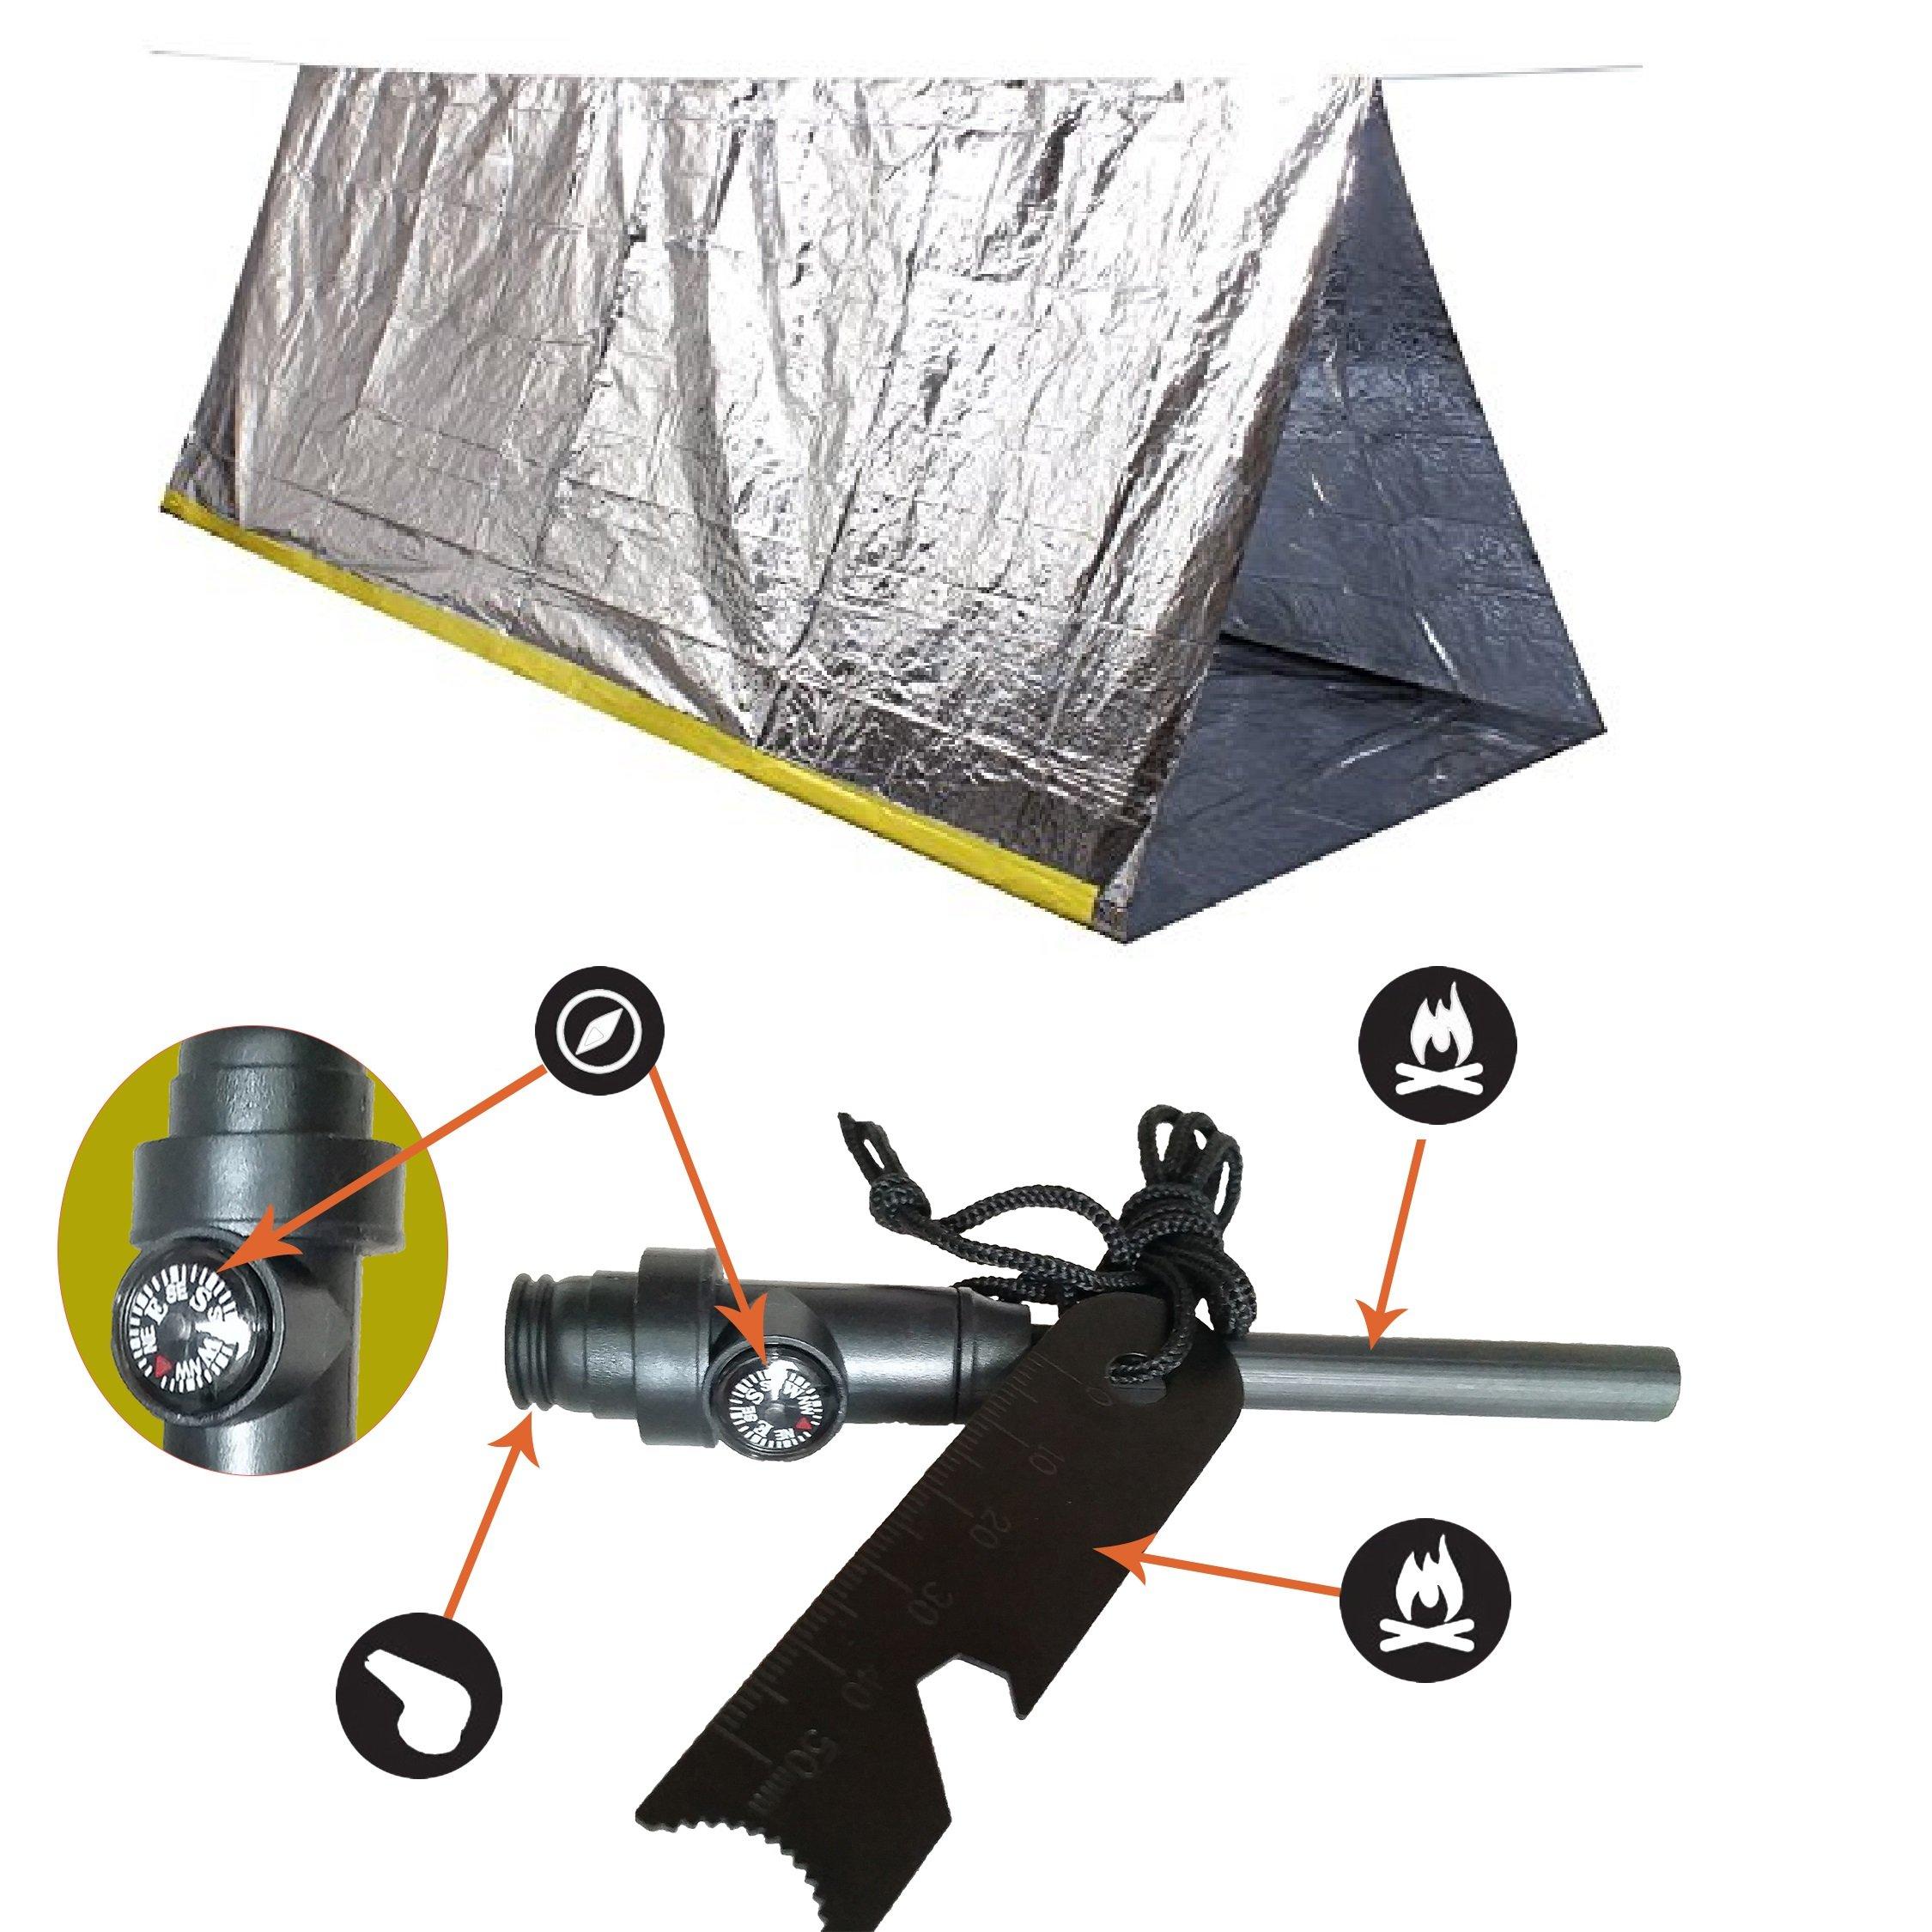 Emergency Mylar Tent u0026 Magnesium Fire Starter Kit | 8âu20ac™ X 5âu20ac™ Thermal Survival Shelter Tube Tent | Conserves Heat | Best Survival Gear  sc 1 st  eBay & Emergency Mylar Survival Shelter Tent With Survival Fire Starter ...